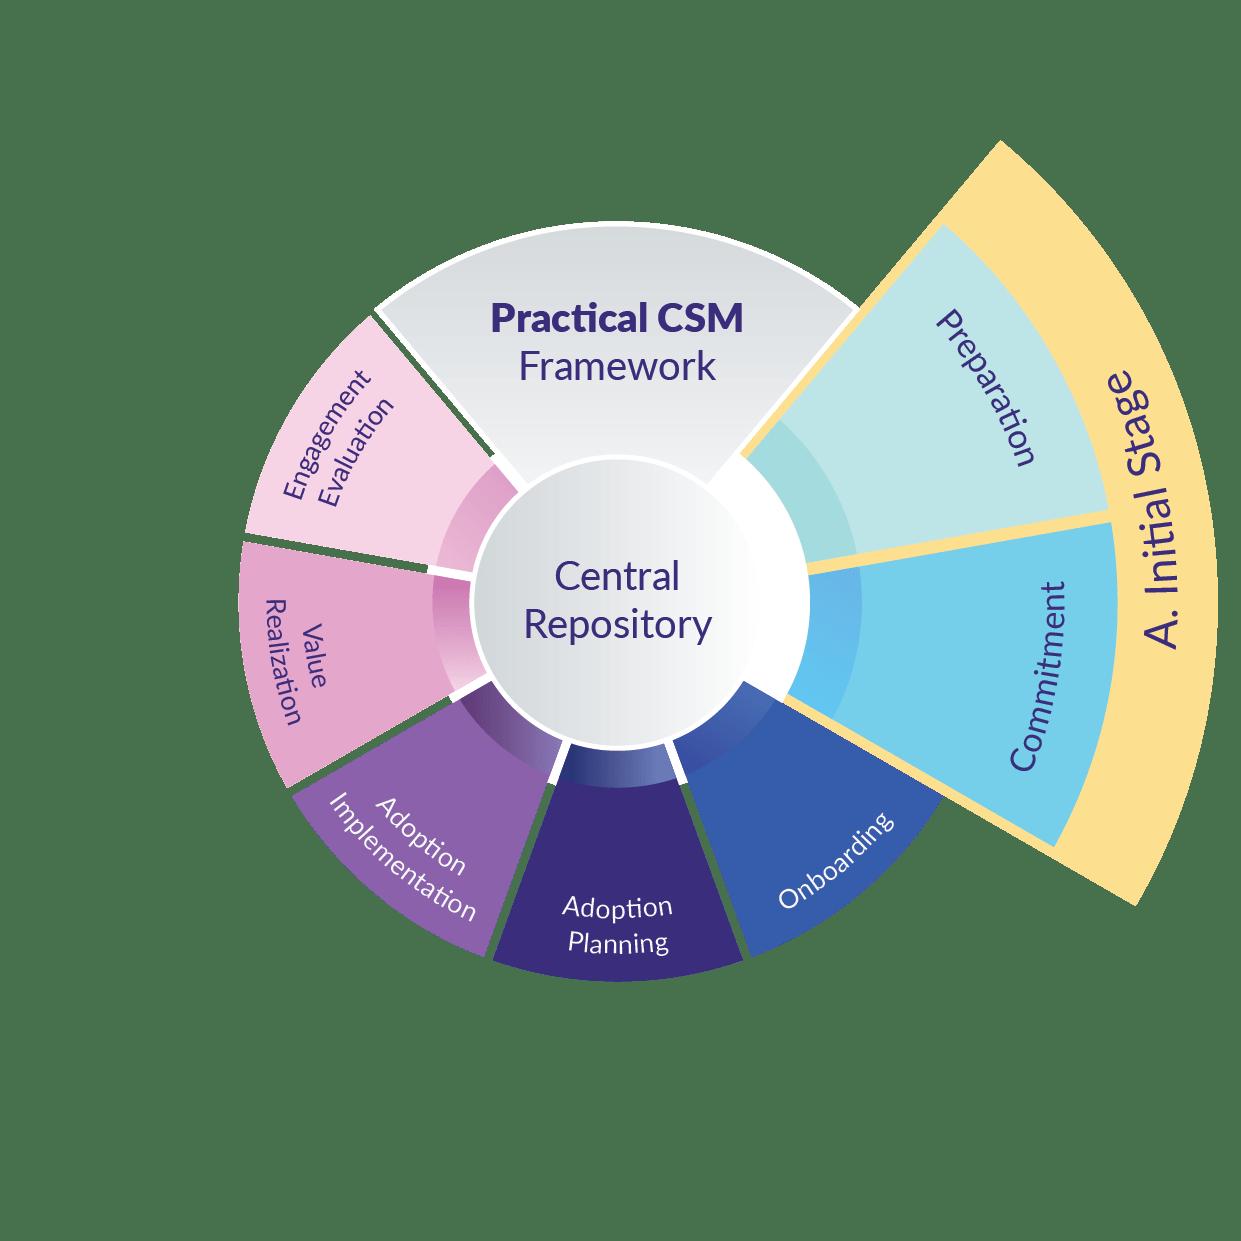 Practical CSM Framework